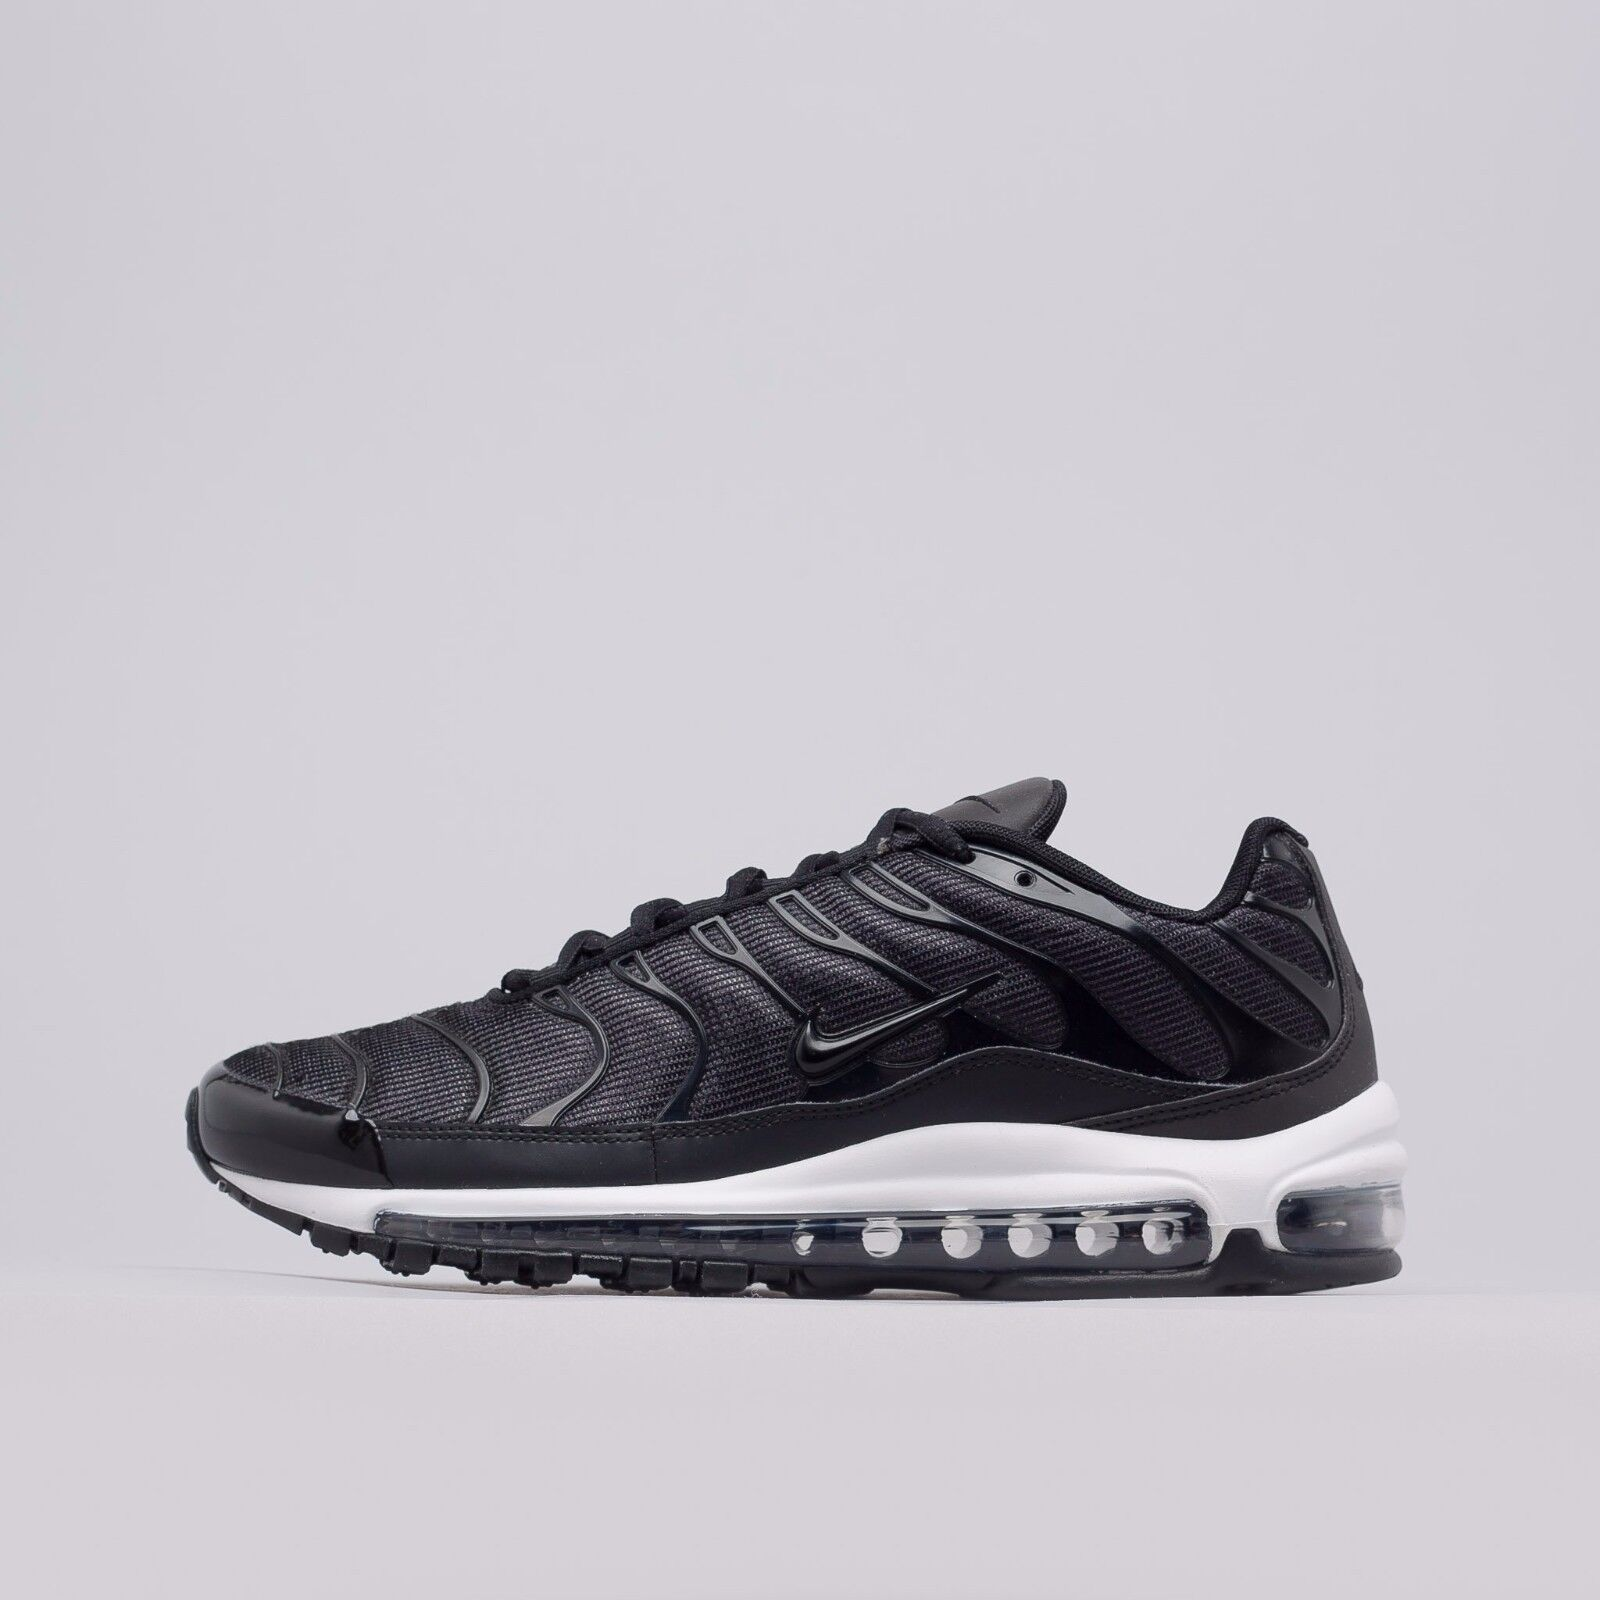 "Nike Air Max Plus 97 ""Tune Up""  Black white AH8144-001 Mens Sizes"